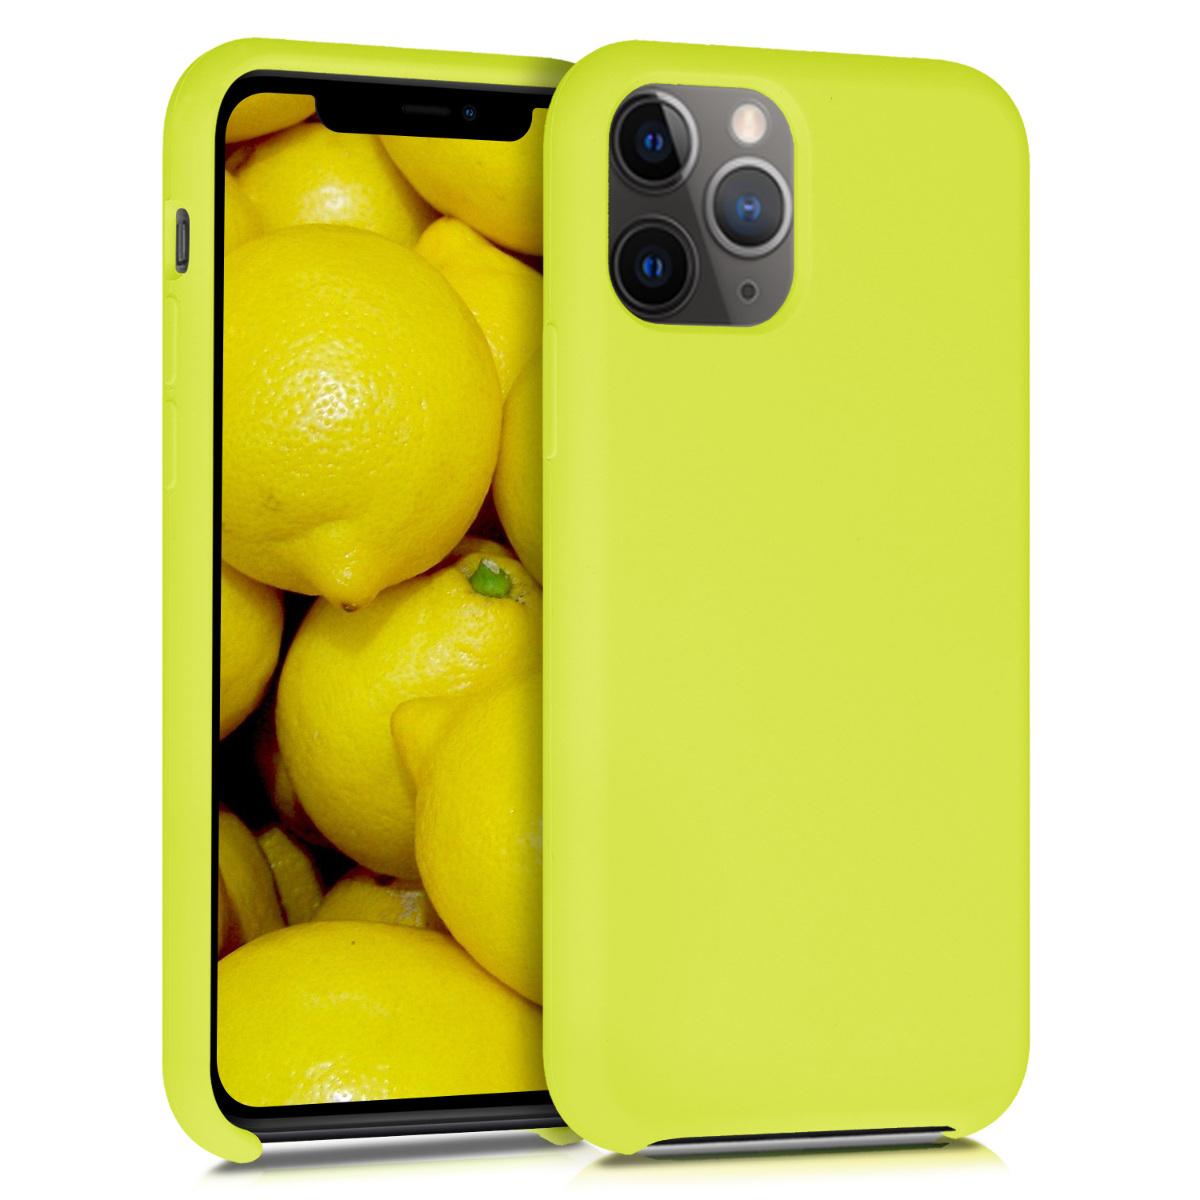 KW Θήκη Σιλικόνης iPhone 11 Pro Max - Soft Flexible Rubber - Lemon Yellow (49725.149)